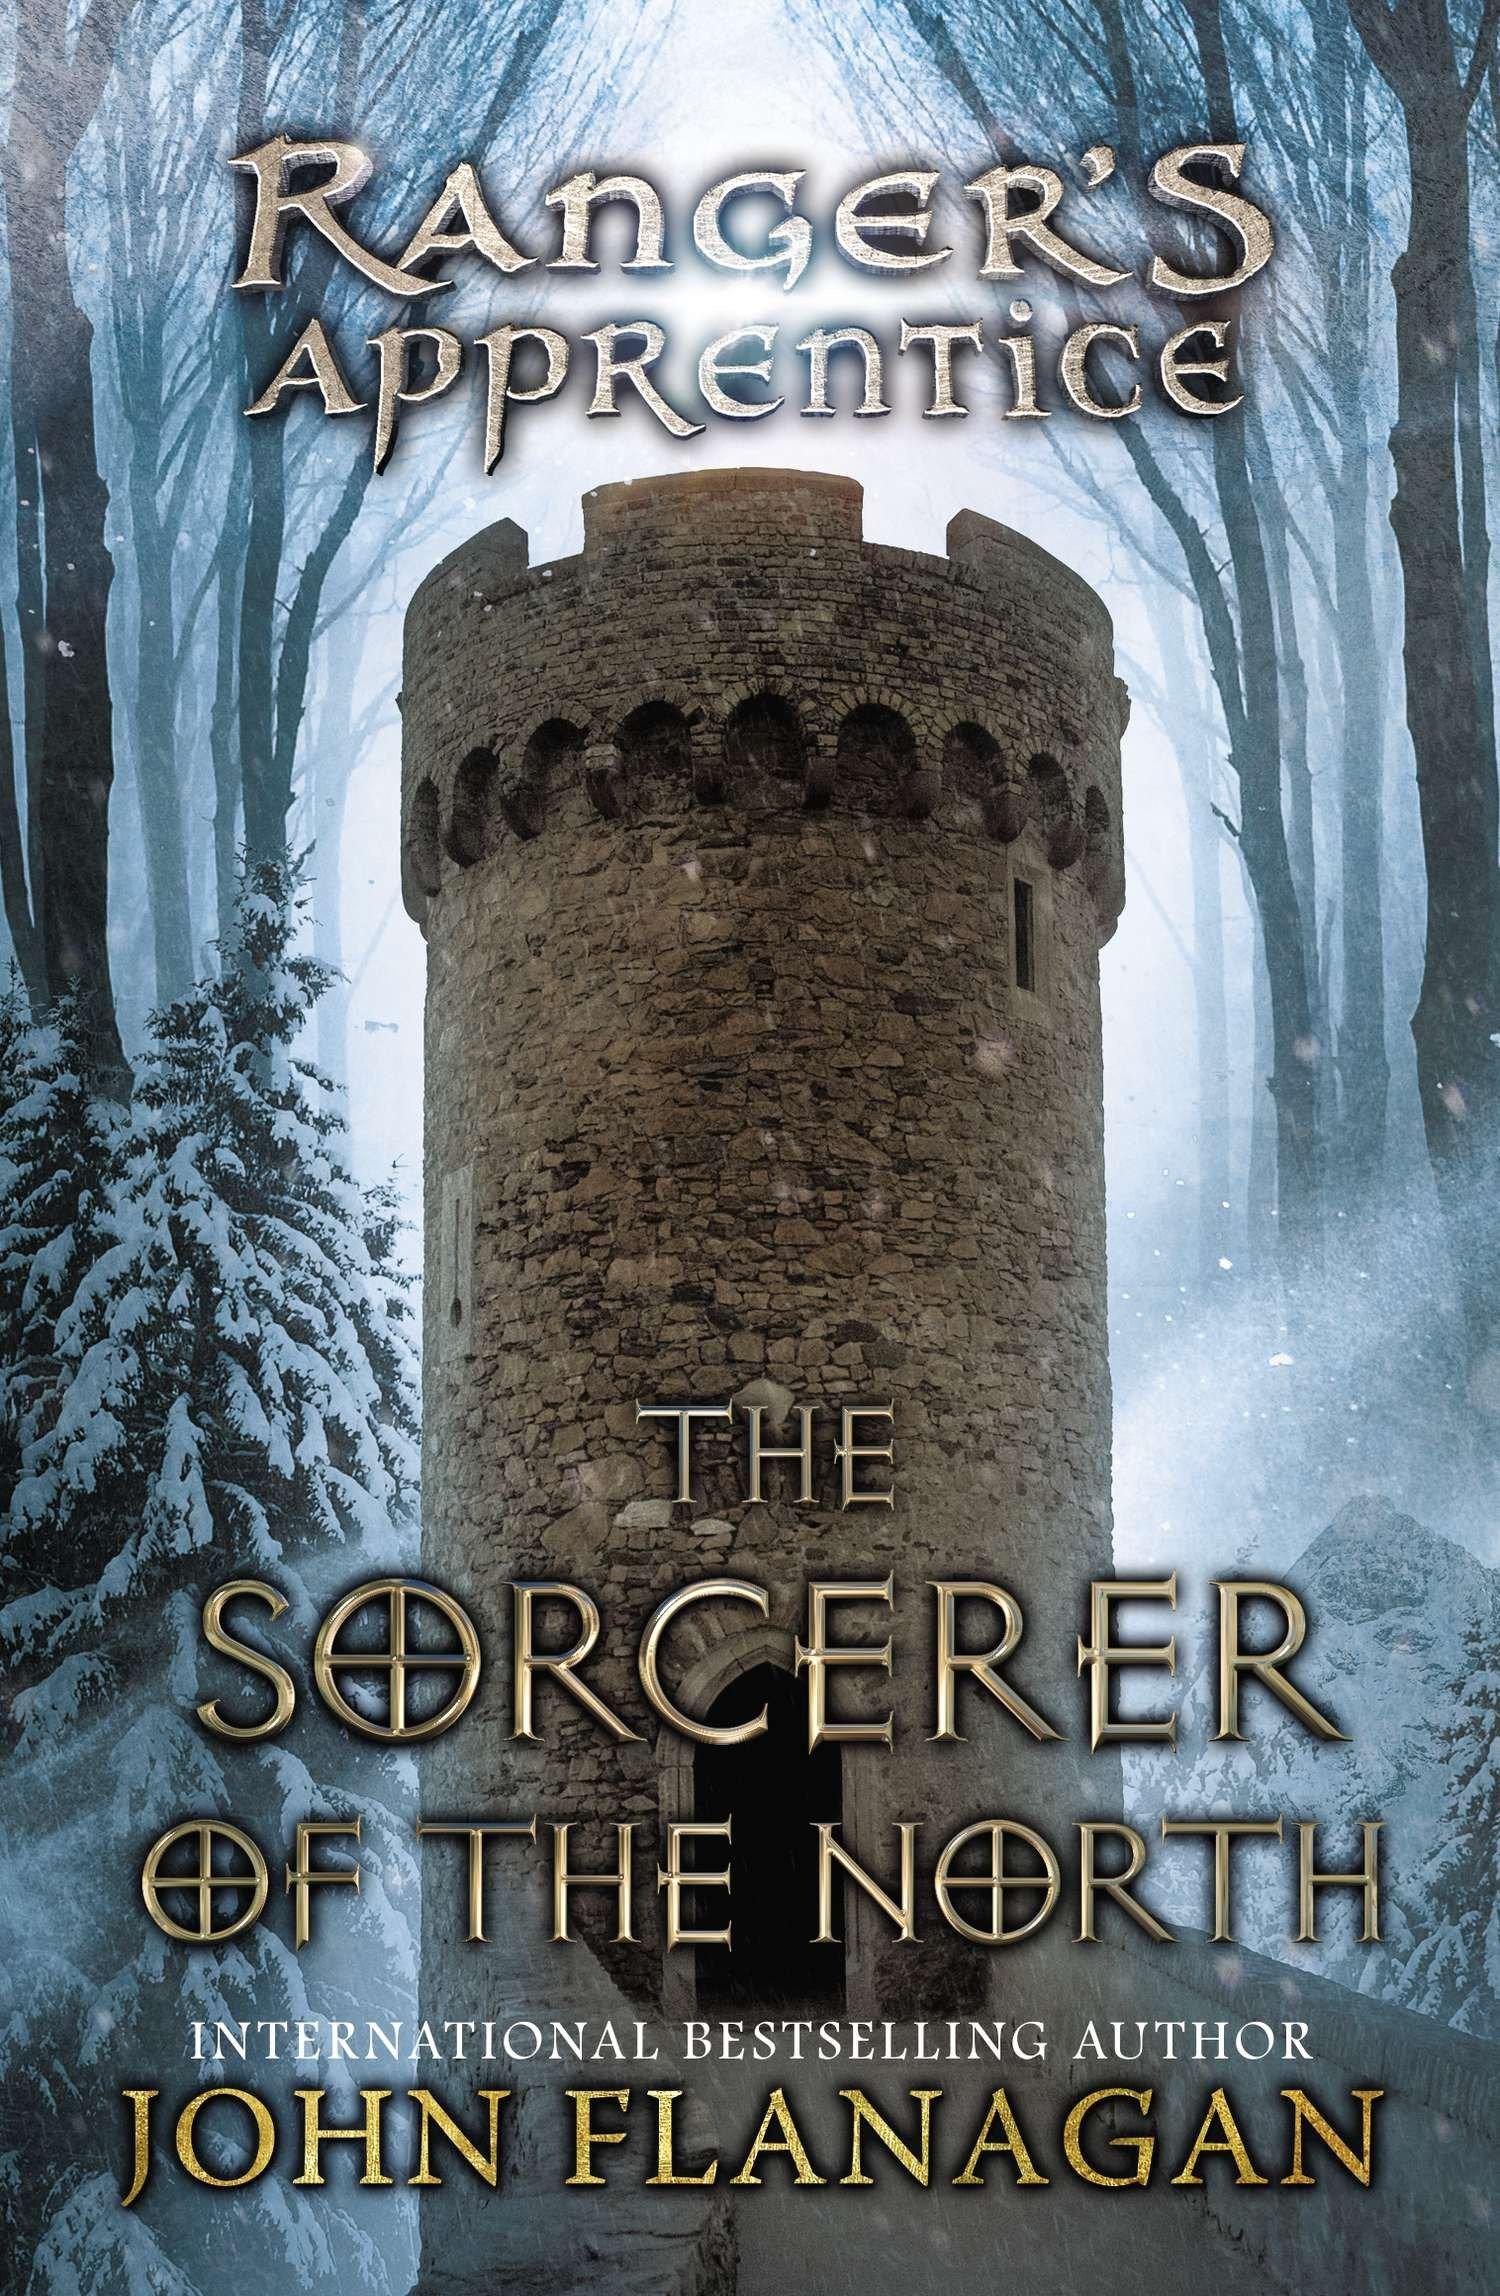 Ranger's Apprentice: The Sorcerer in the North - John Flanagan